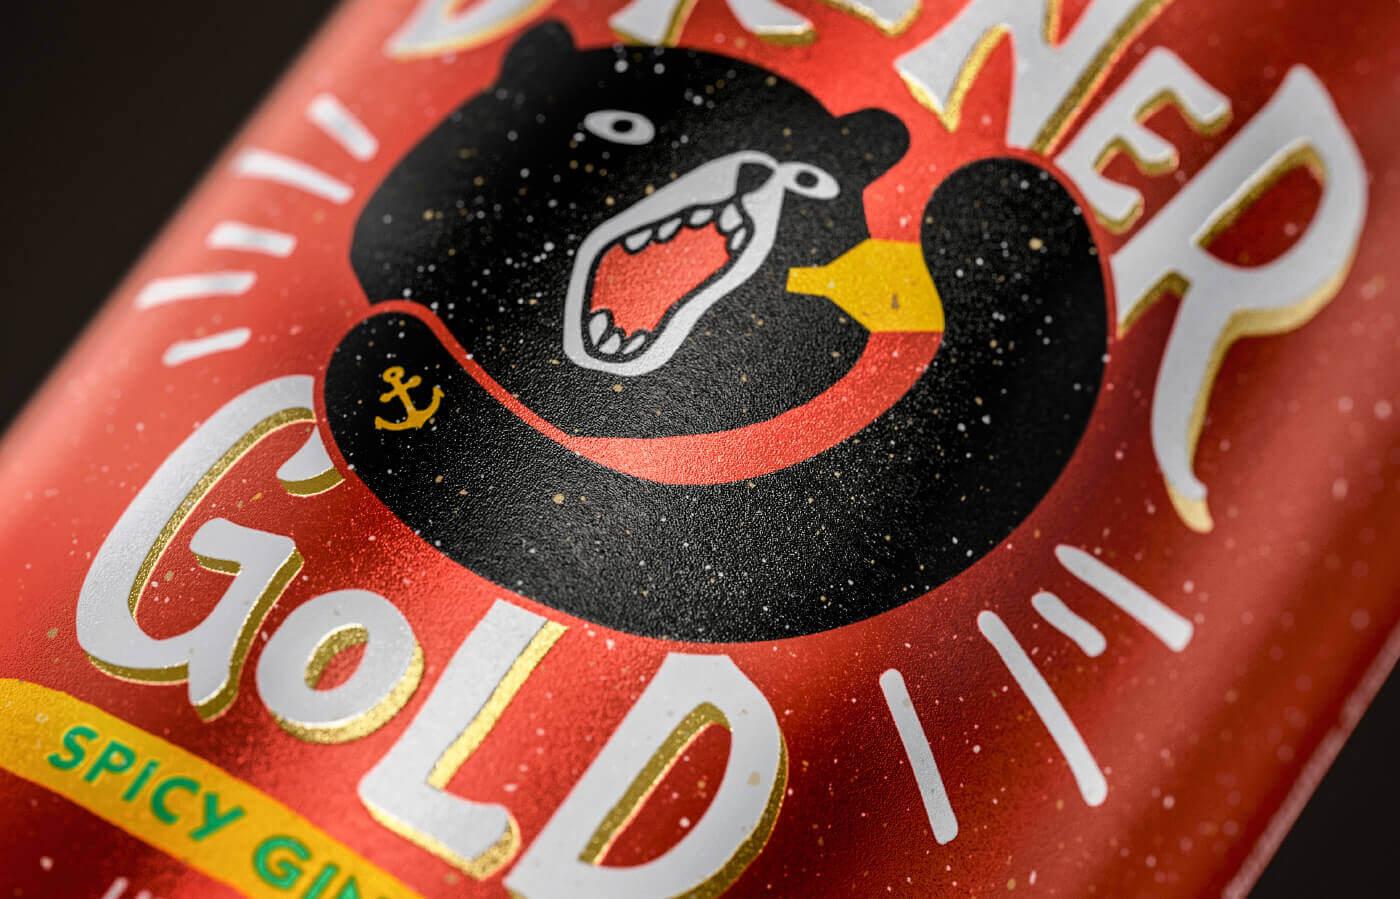 cyclos berliner gold vivaris flasche etikett